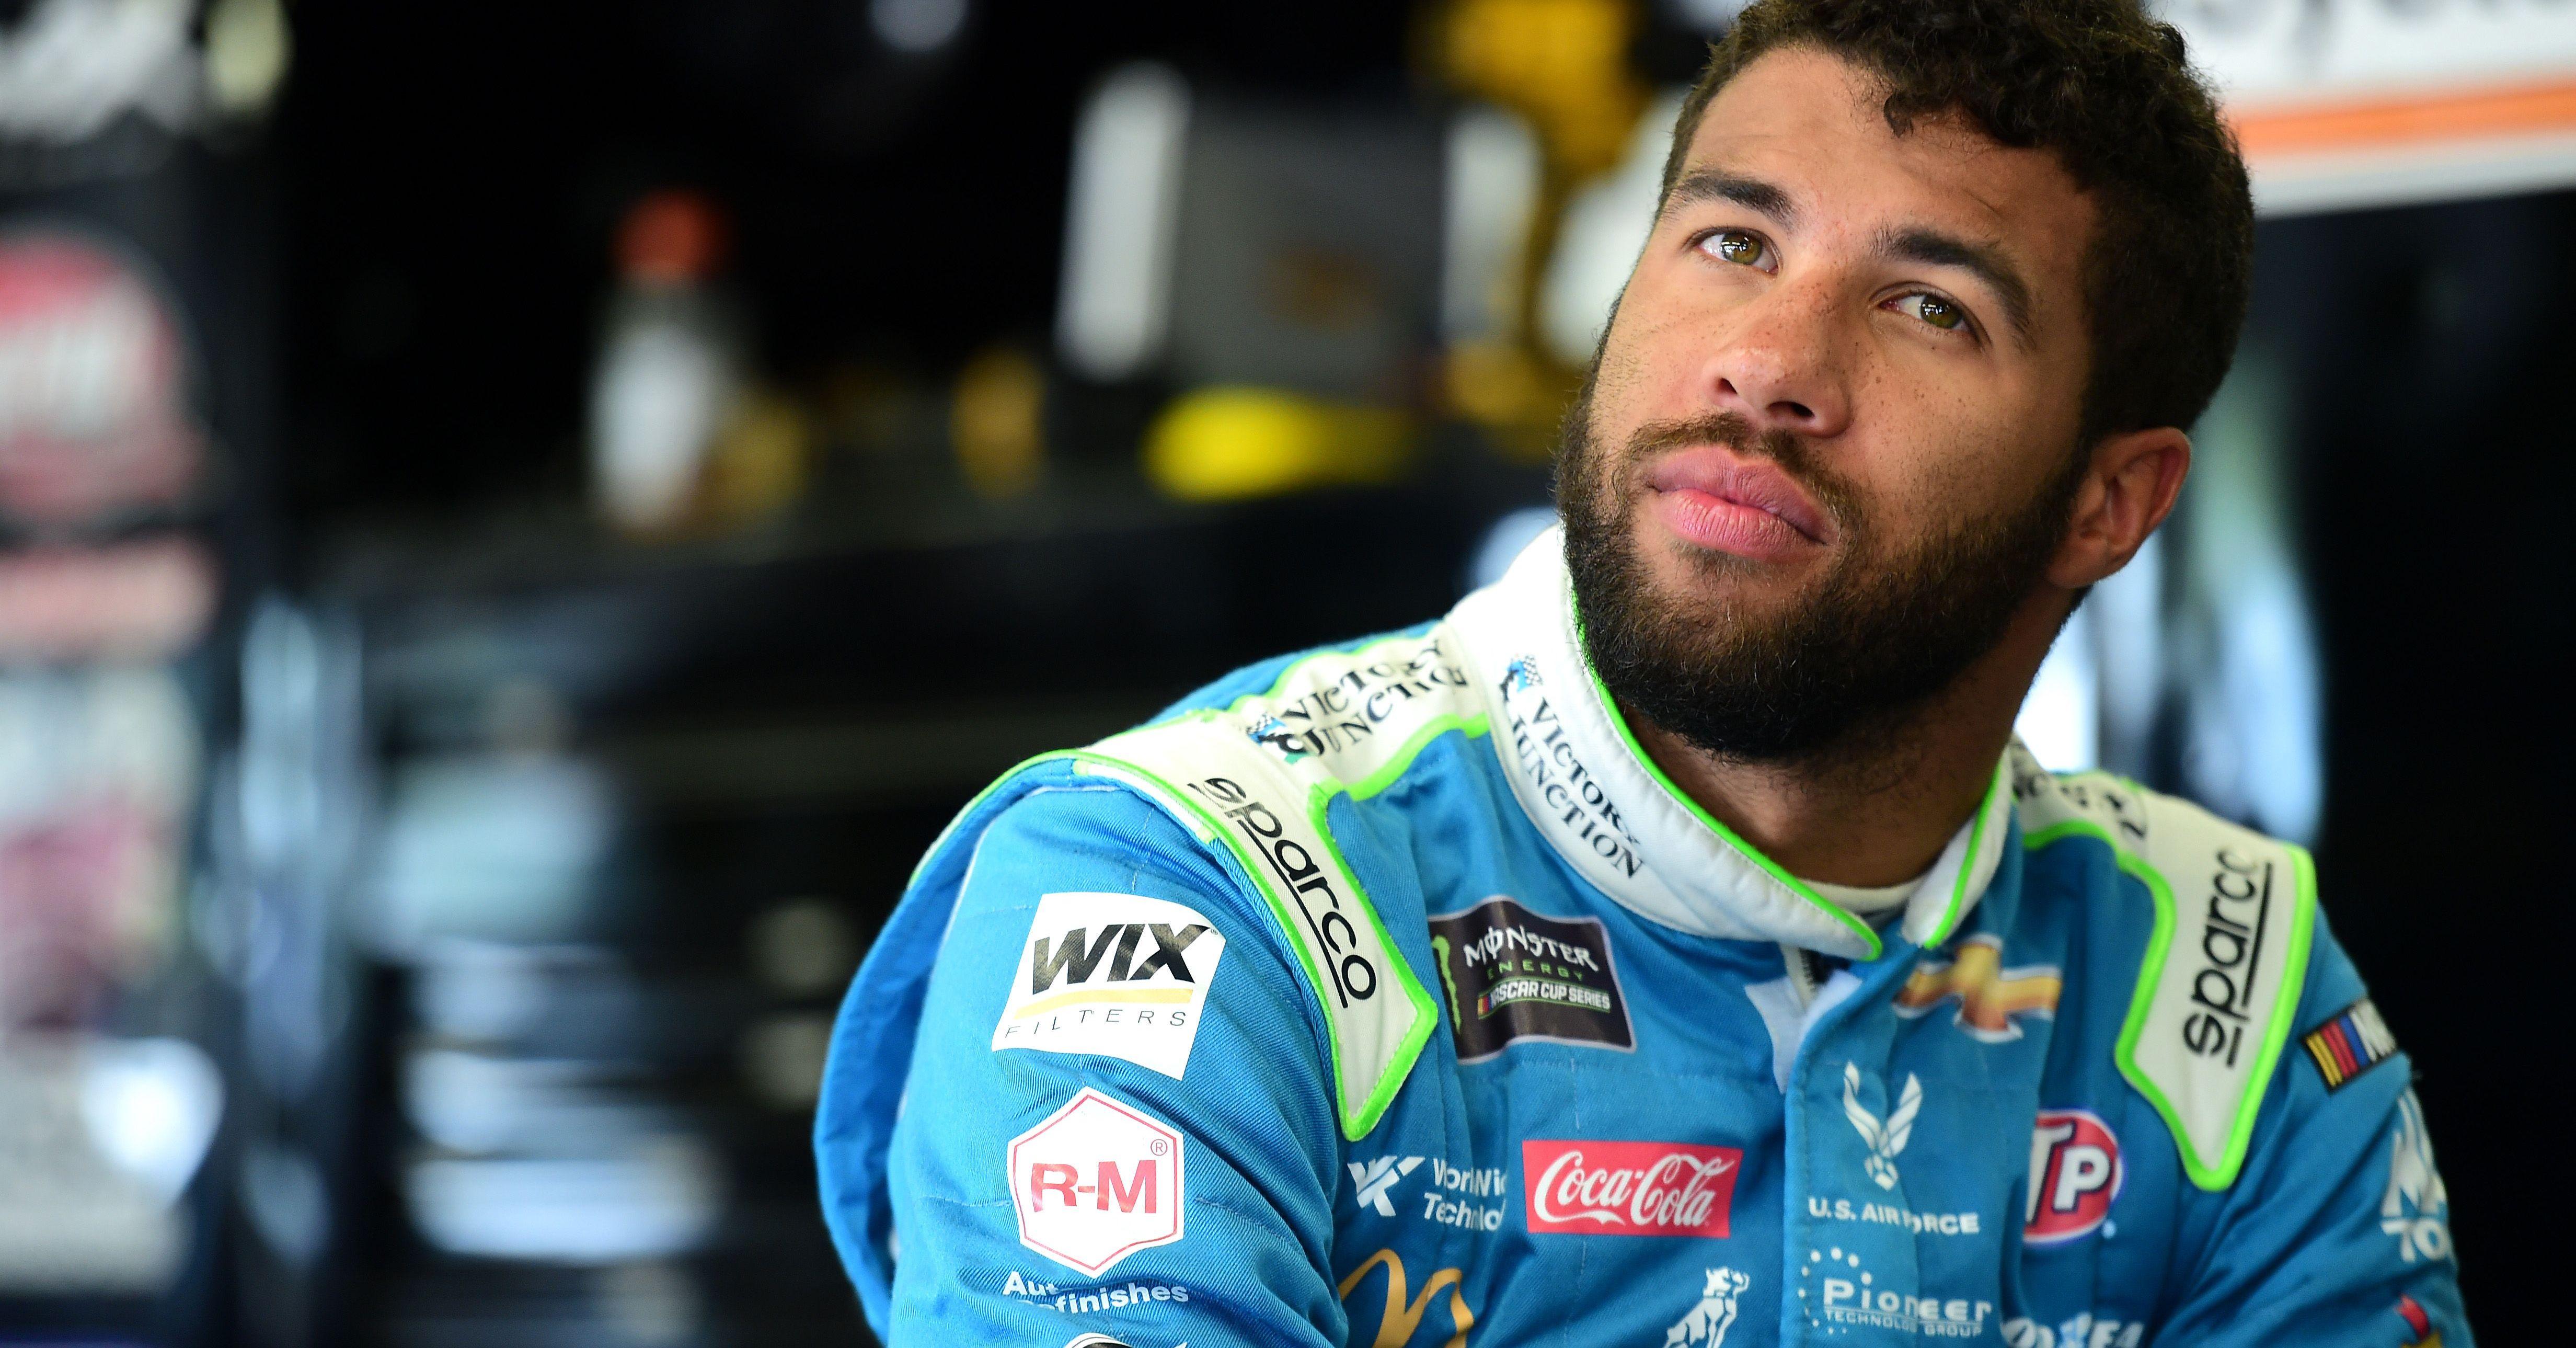 NASCAR Driver Bubba Wallace Will Have Kobe Bryant Tribute On His Daytona 500 Car – The Blast